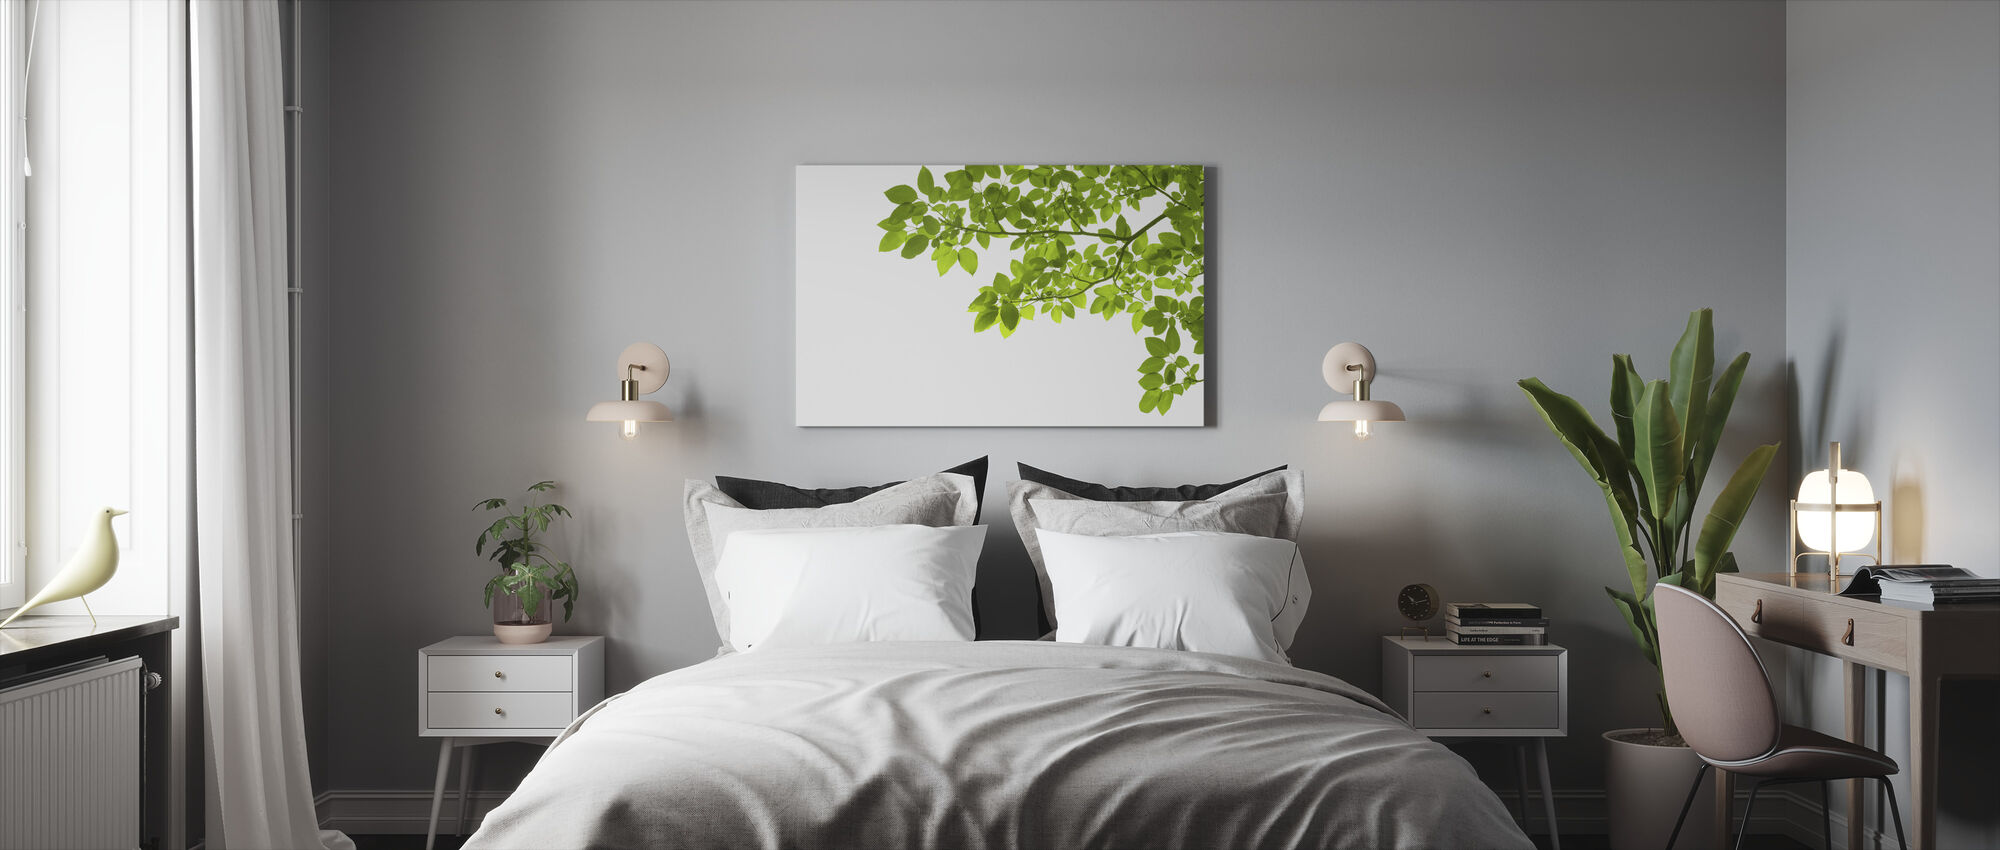 Green Leaves Corner - Canvas print - Bedroom